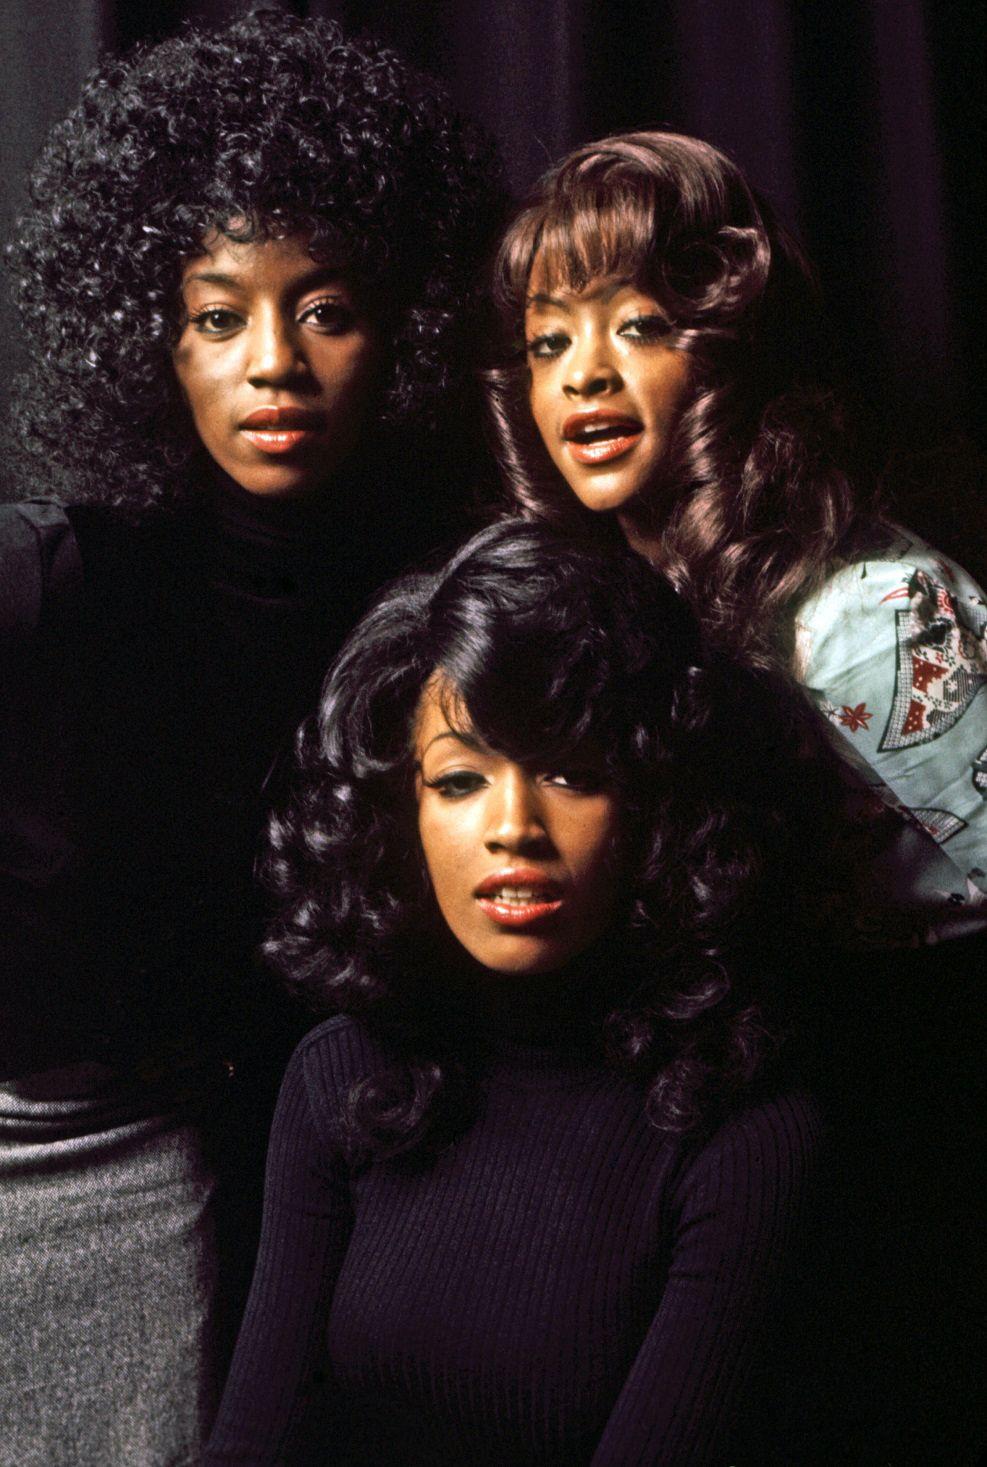 The Three Degrees R&b artists